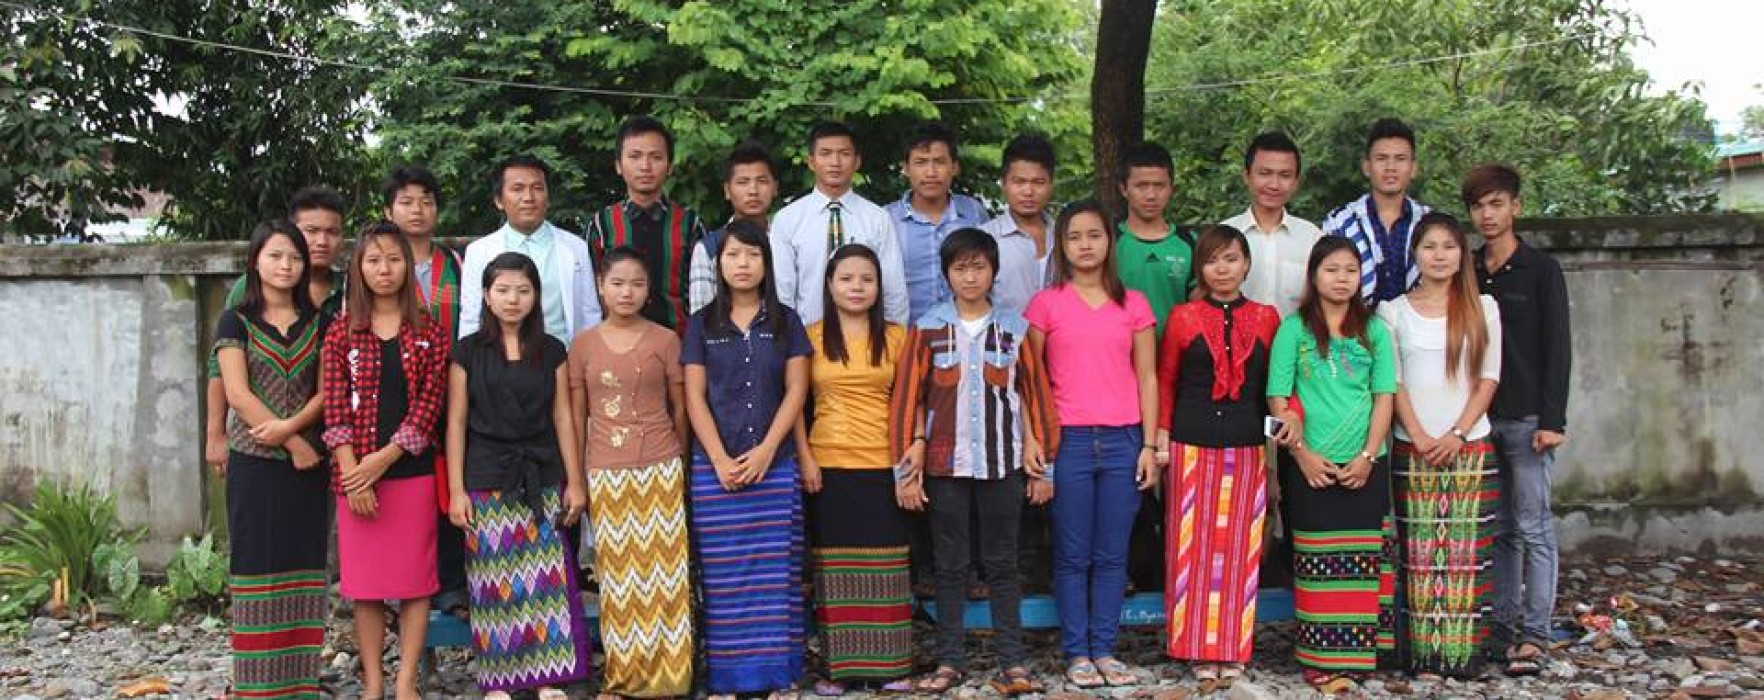 Zanniat Phunsang Tlawngta Pawlkom konghoitu te pawl ai FB hming